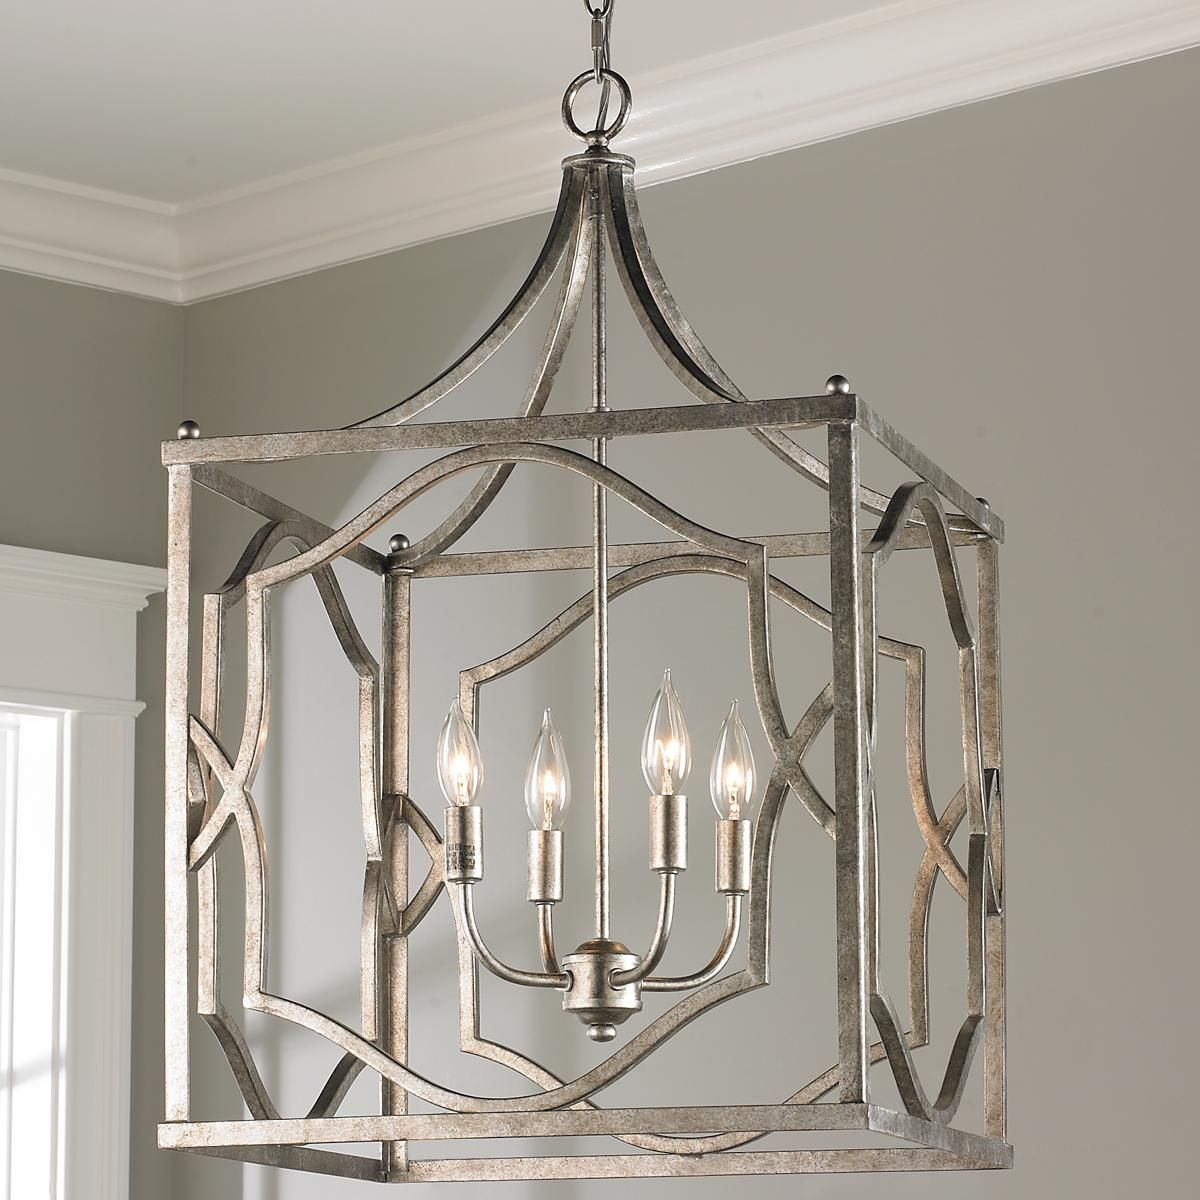 lantern kitchen lighting cabinets dayton ohio modern fretwork cage medium florida house